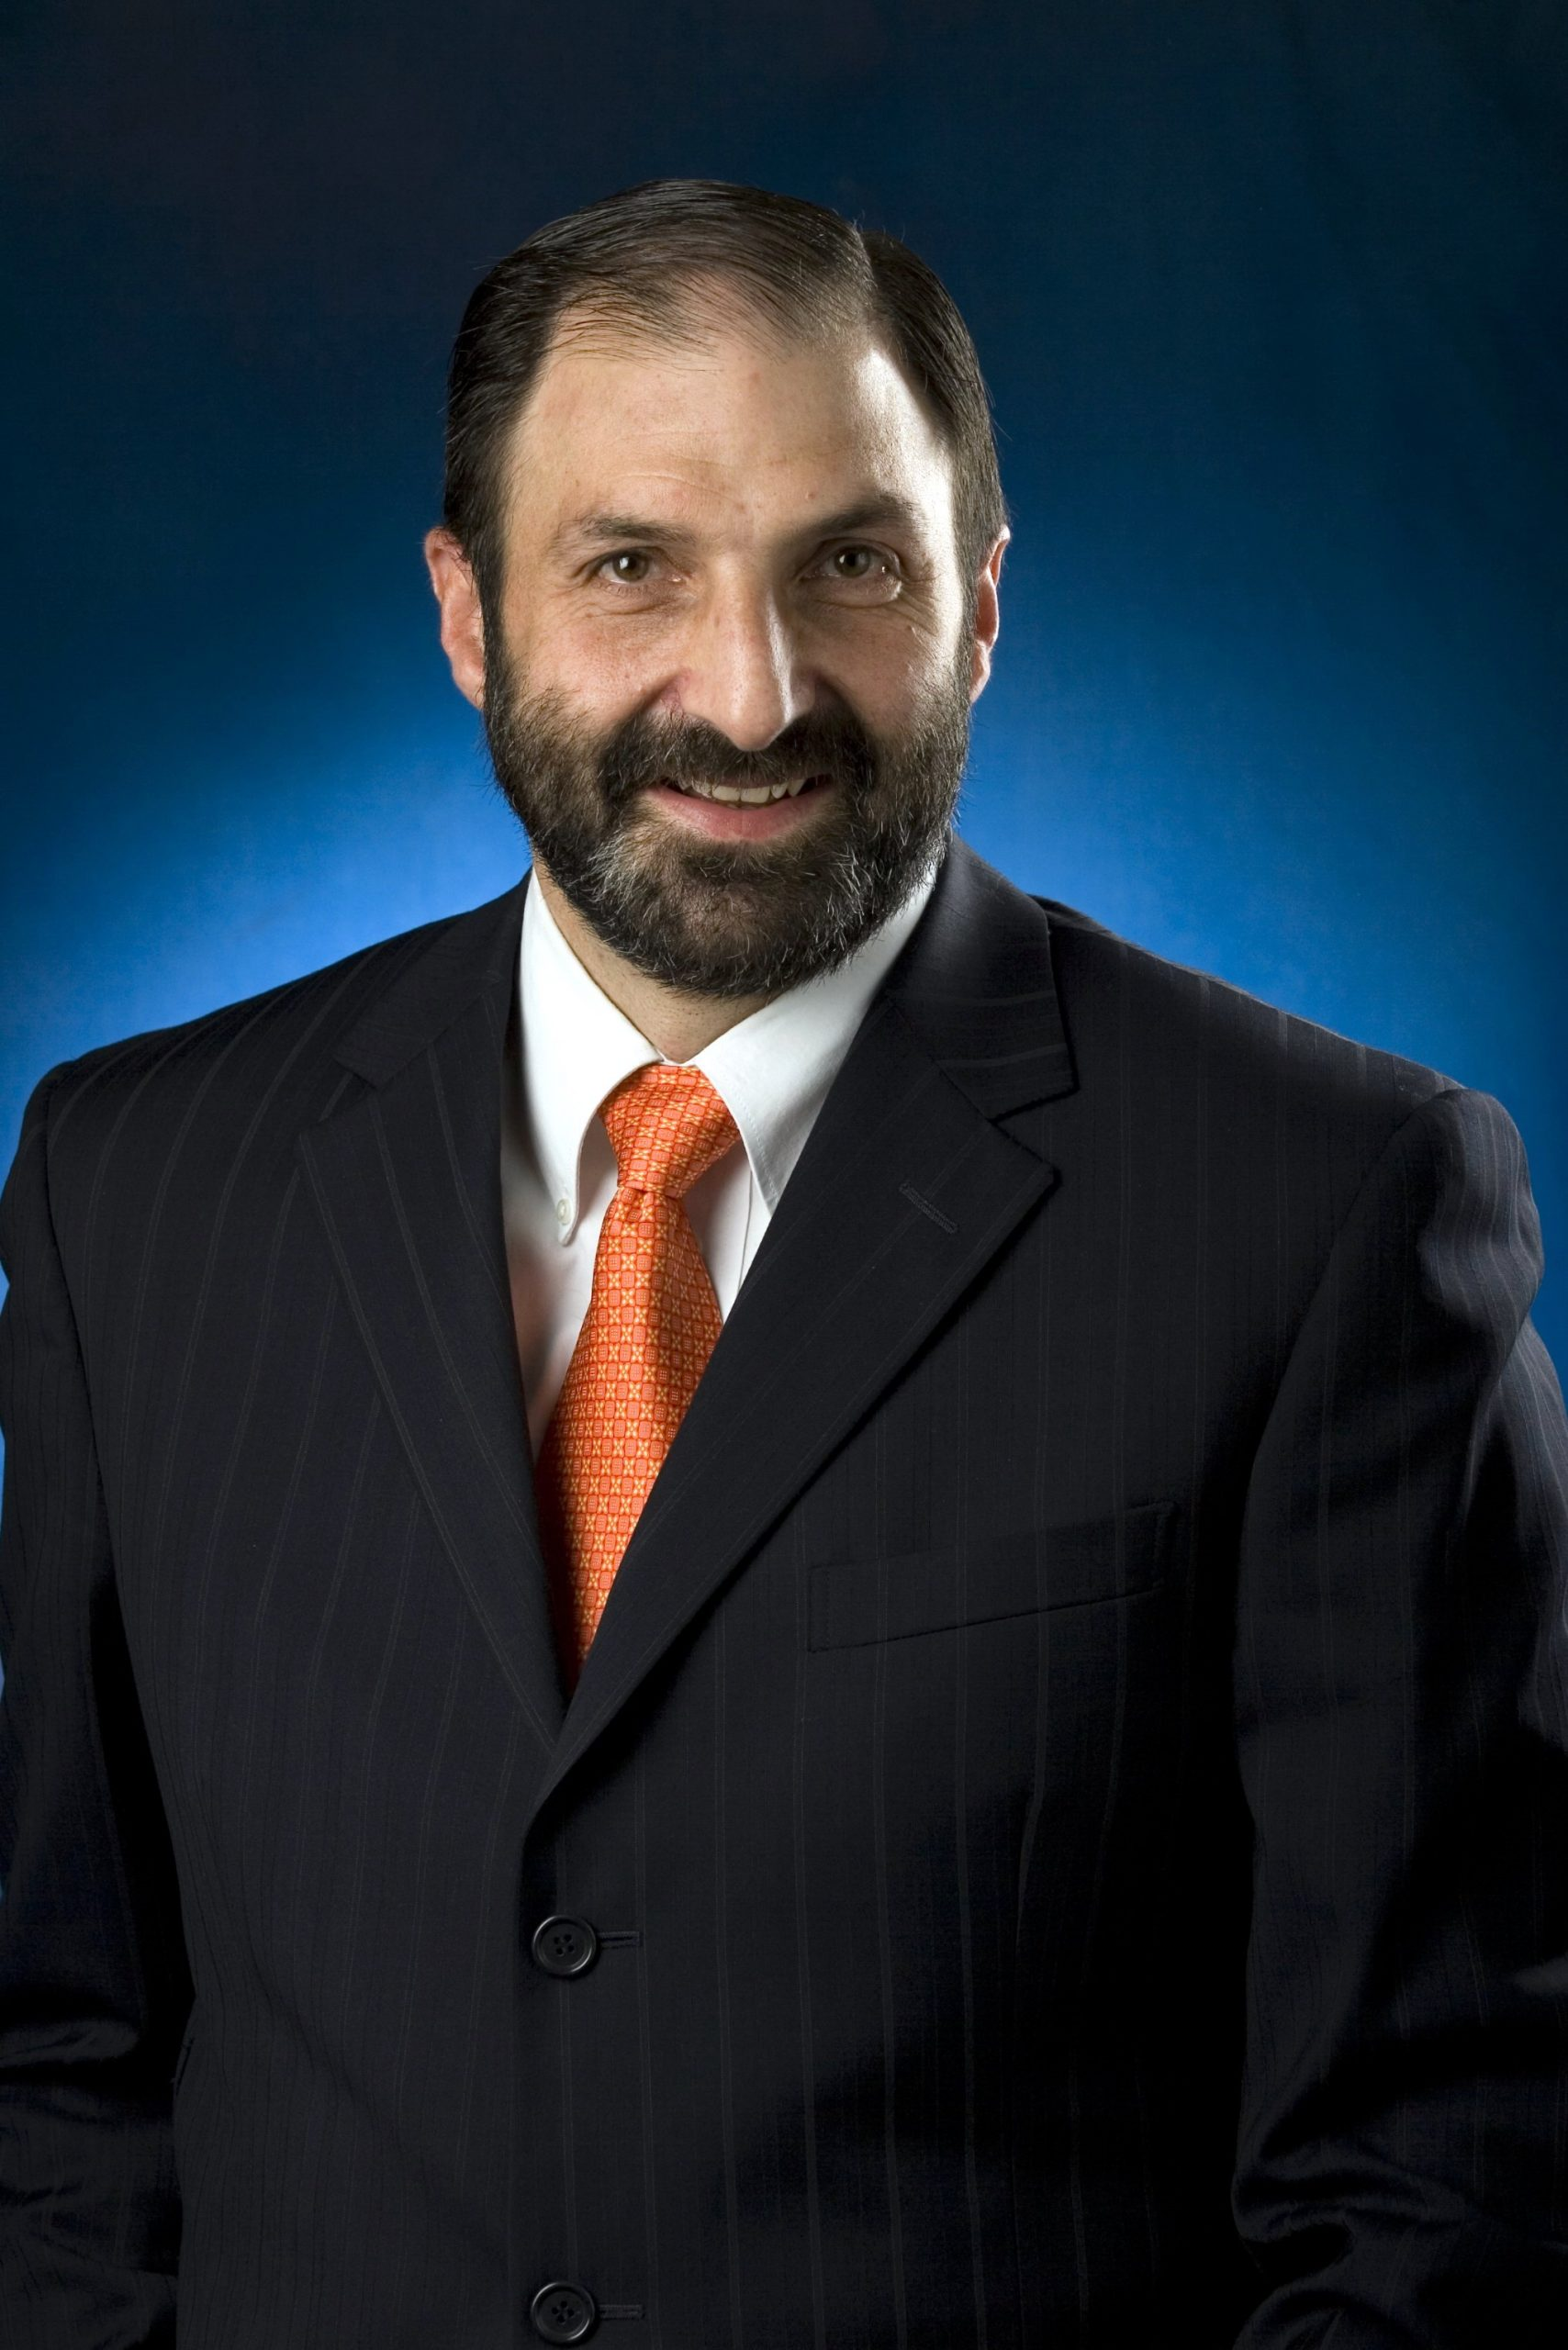 Jaime Berditchevsky